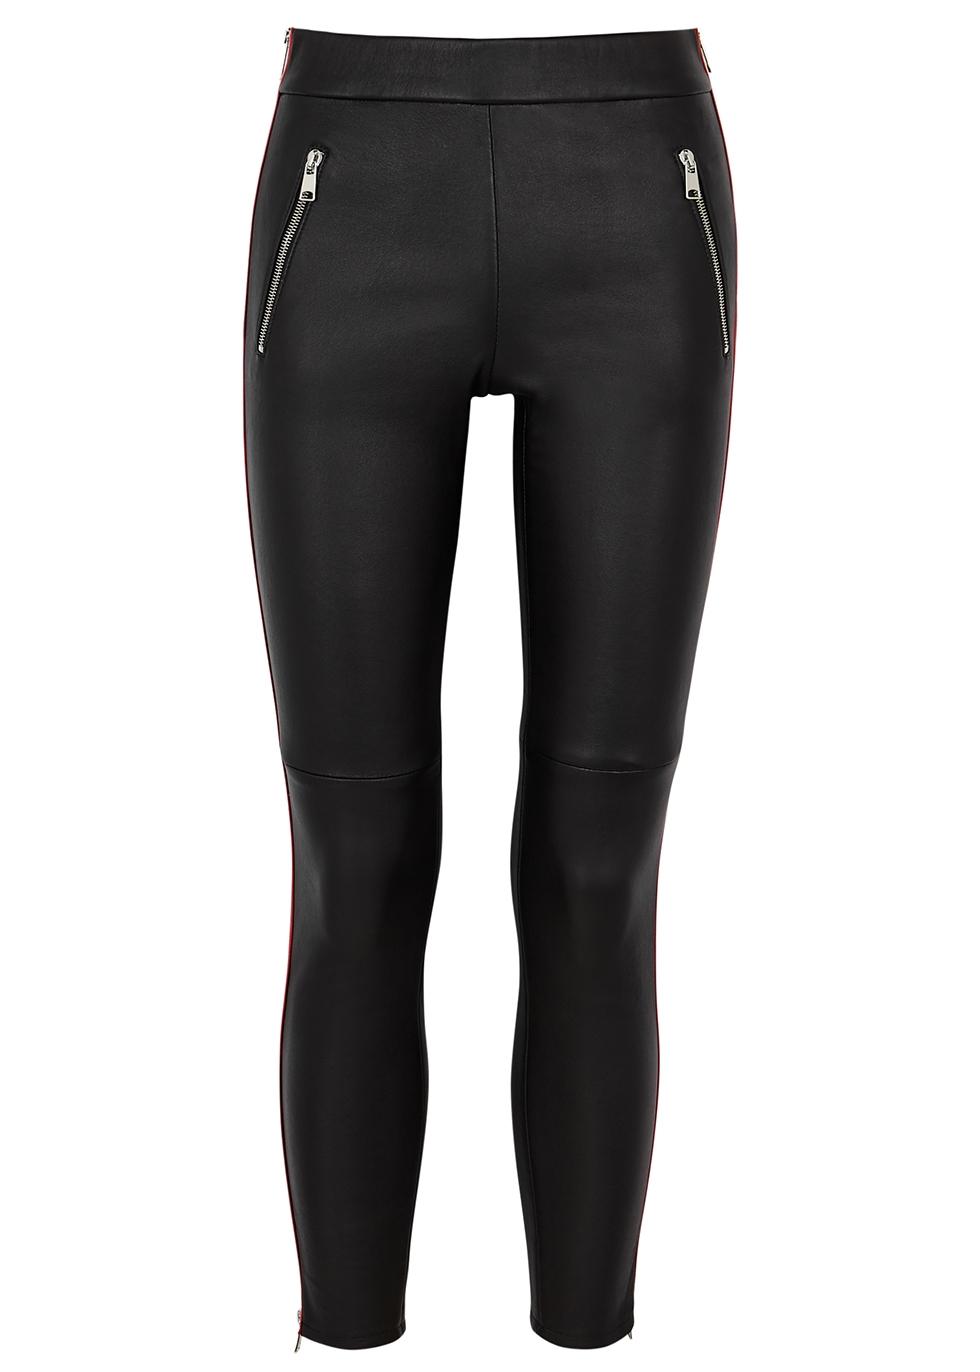 ALEXANDER MCQUEEN   Alexander McQueen Black Striped Leather Trousers   Goxip